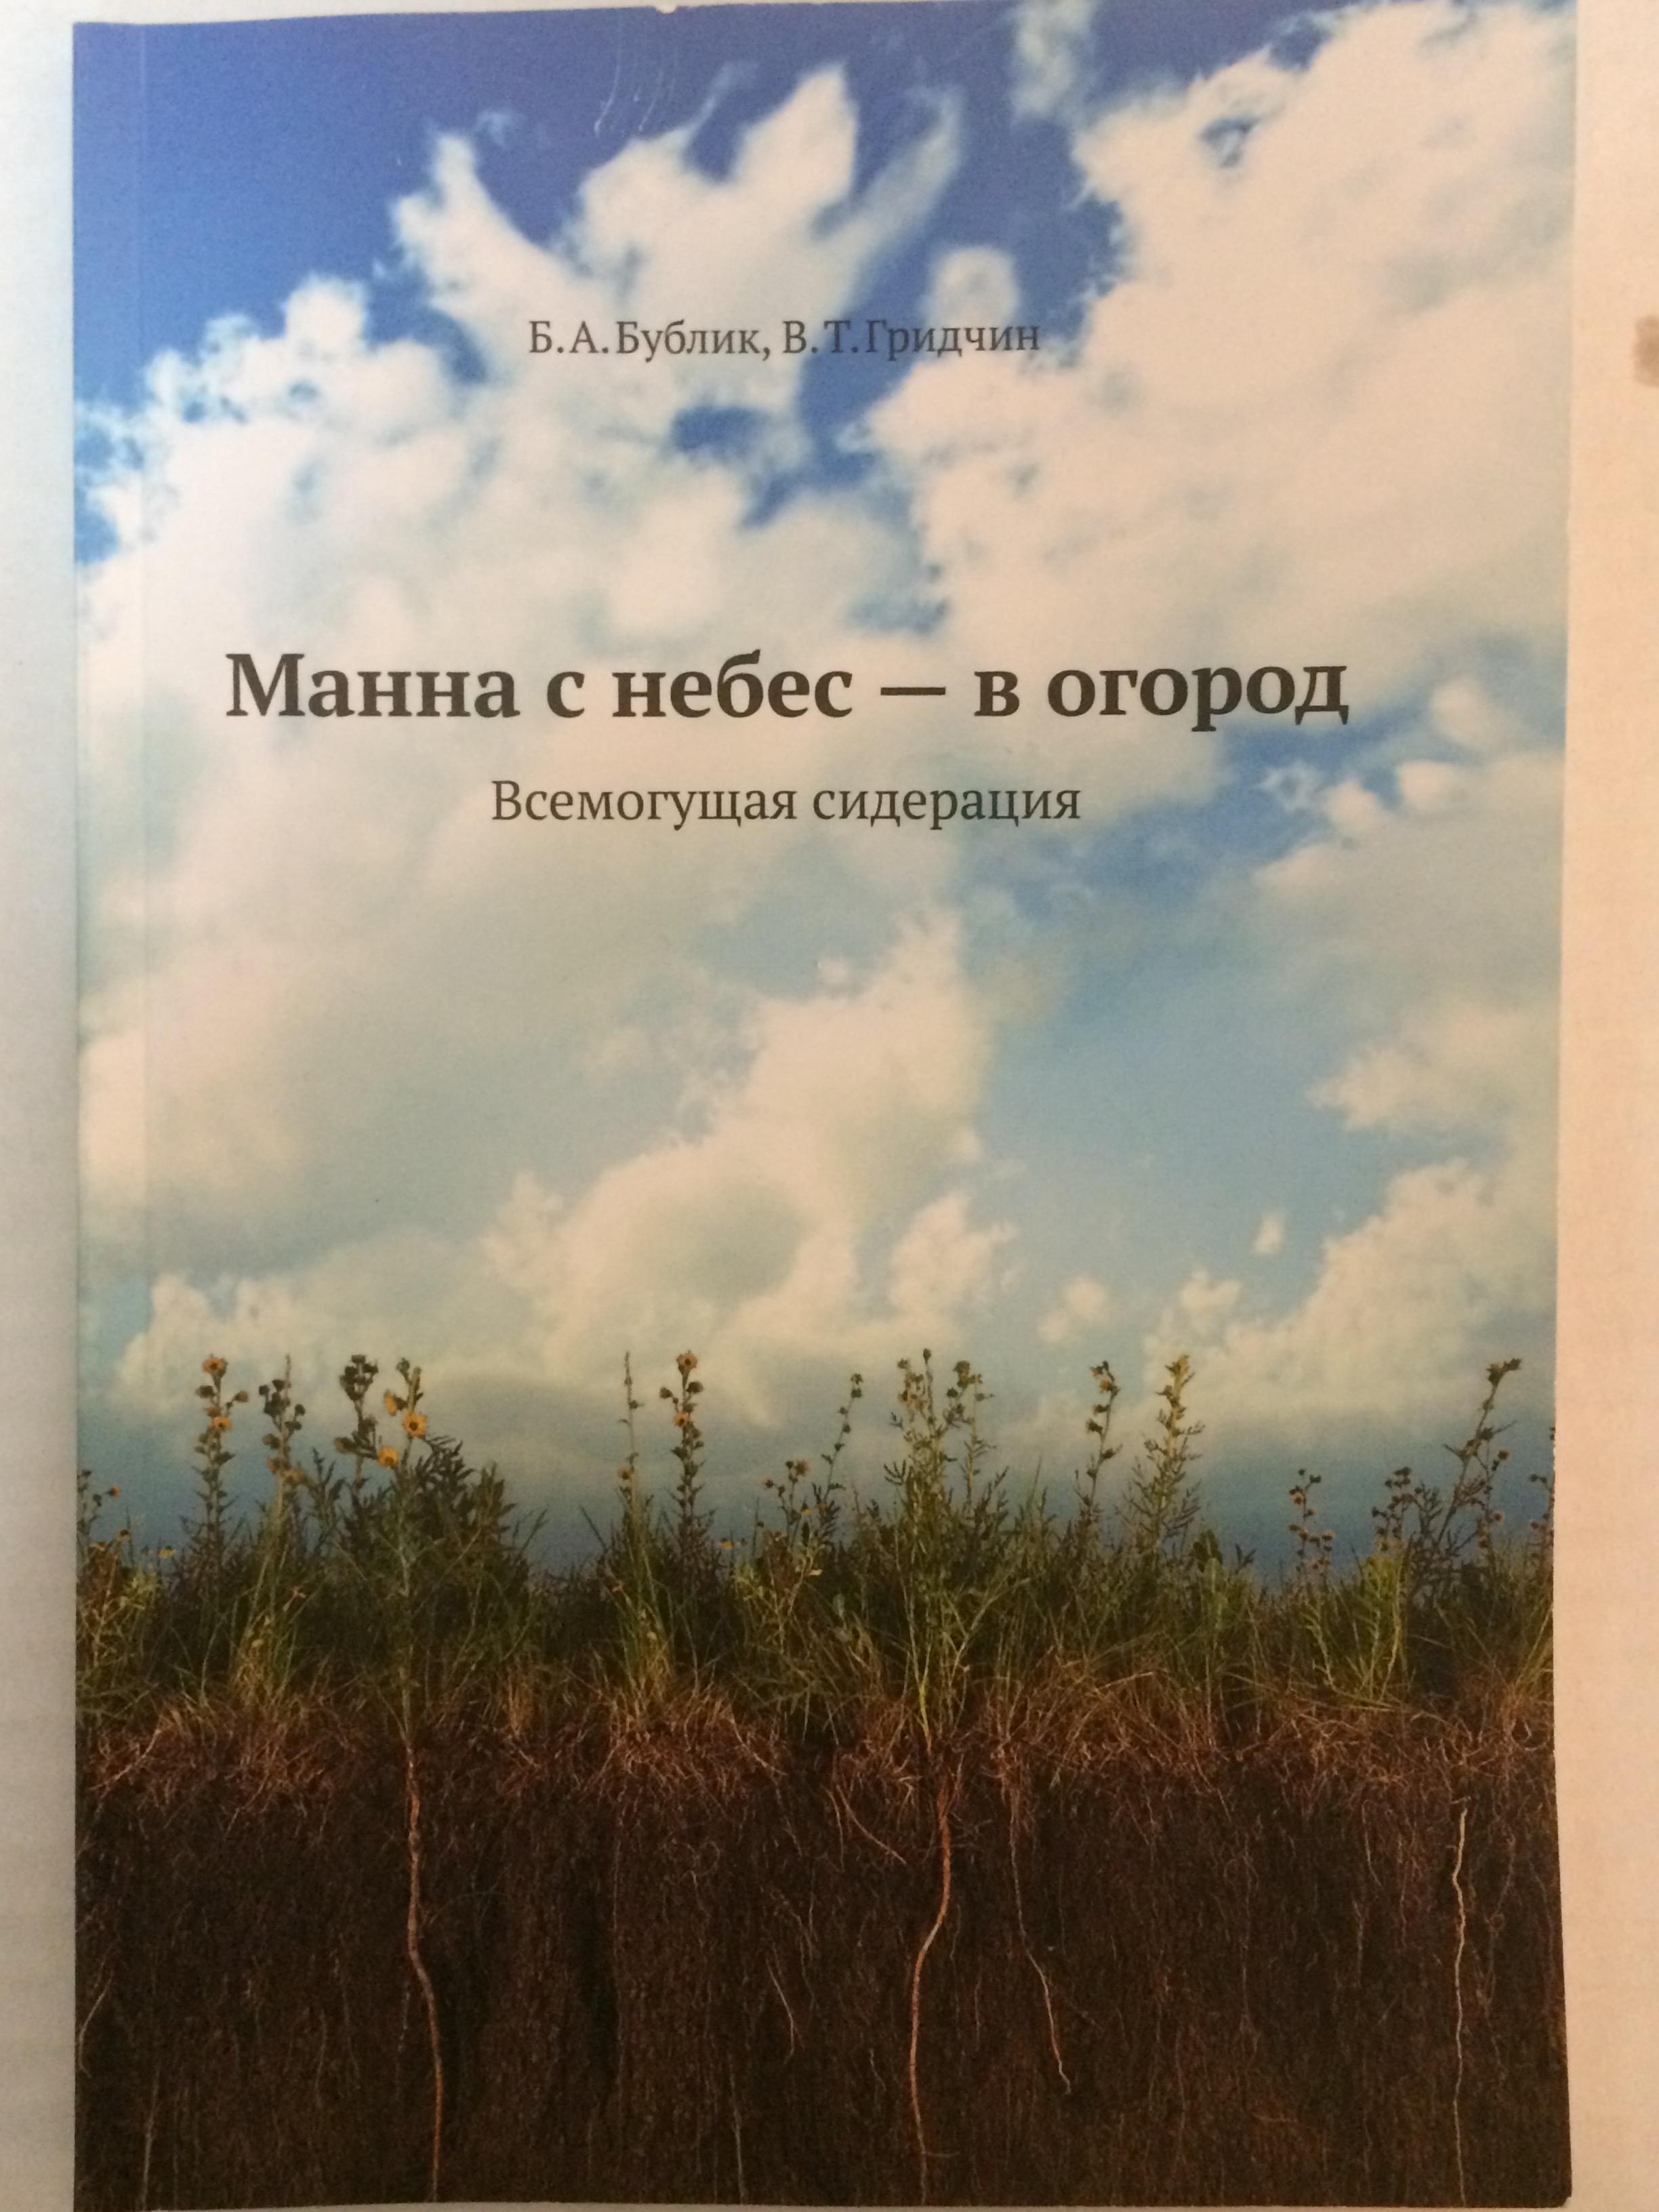 kniga-manna-s-nebes